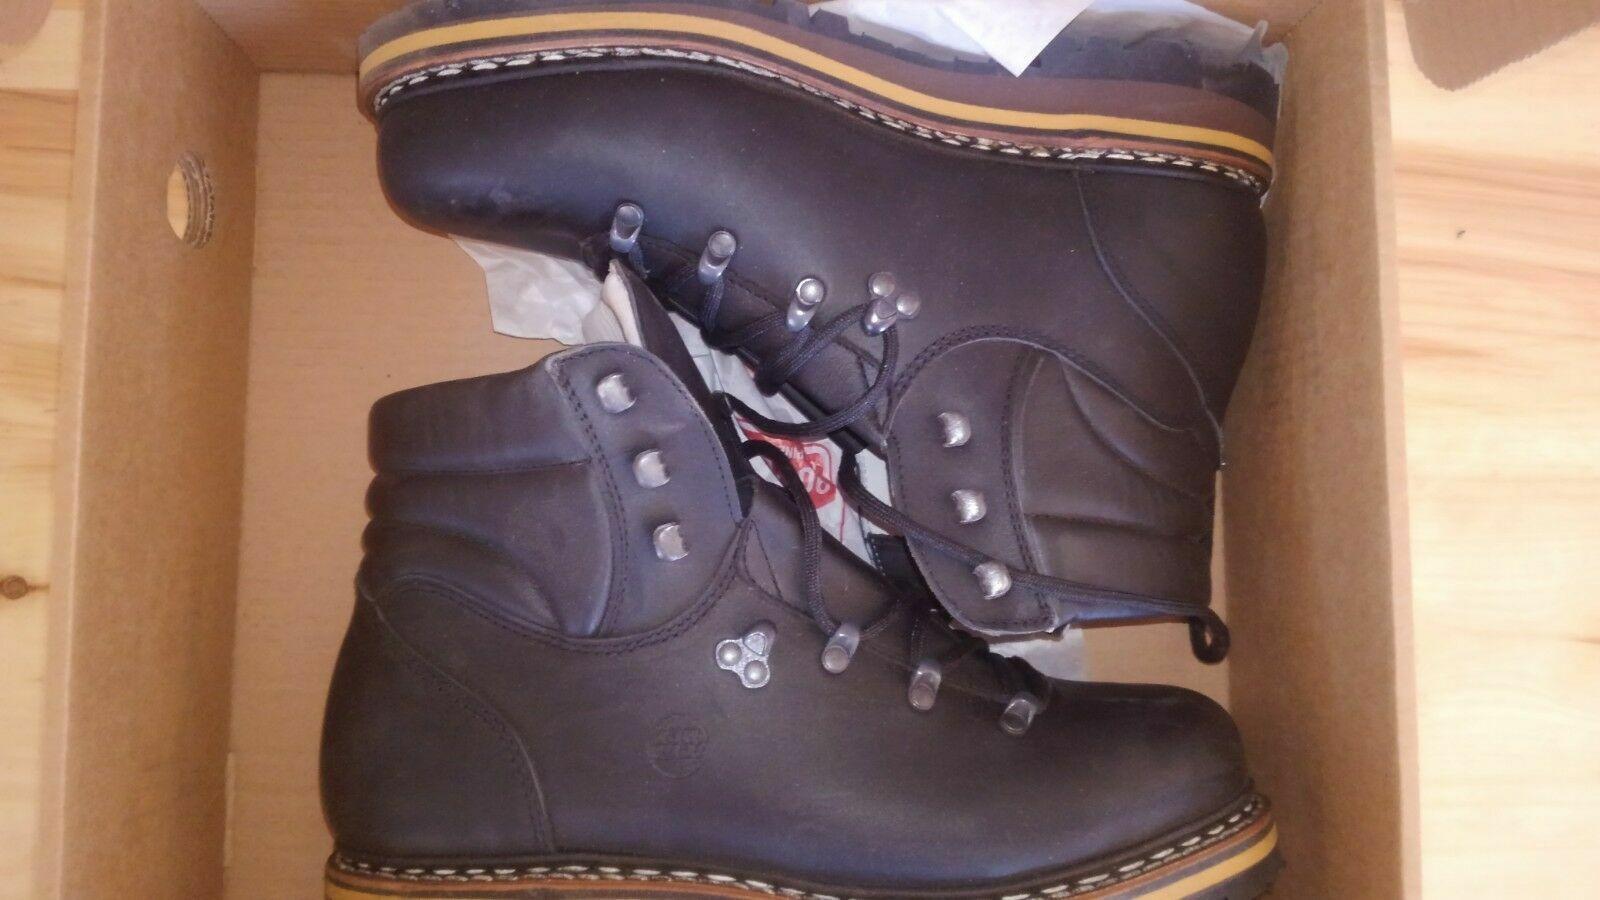 Hanwag hiking boots US11.5 M greenten - brown